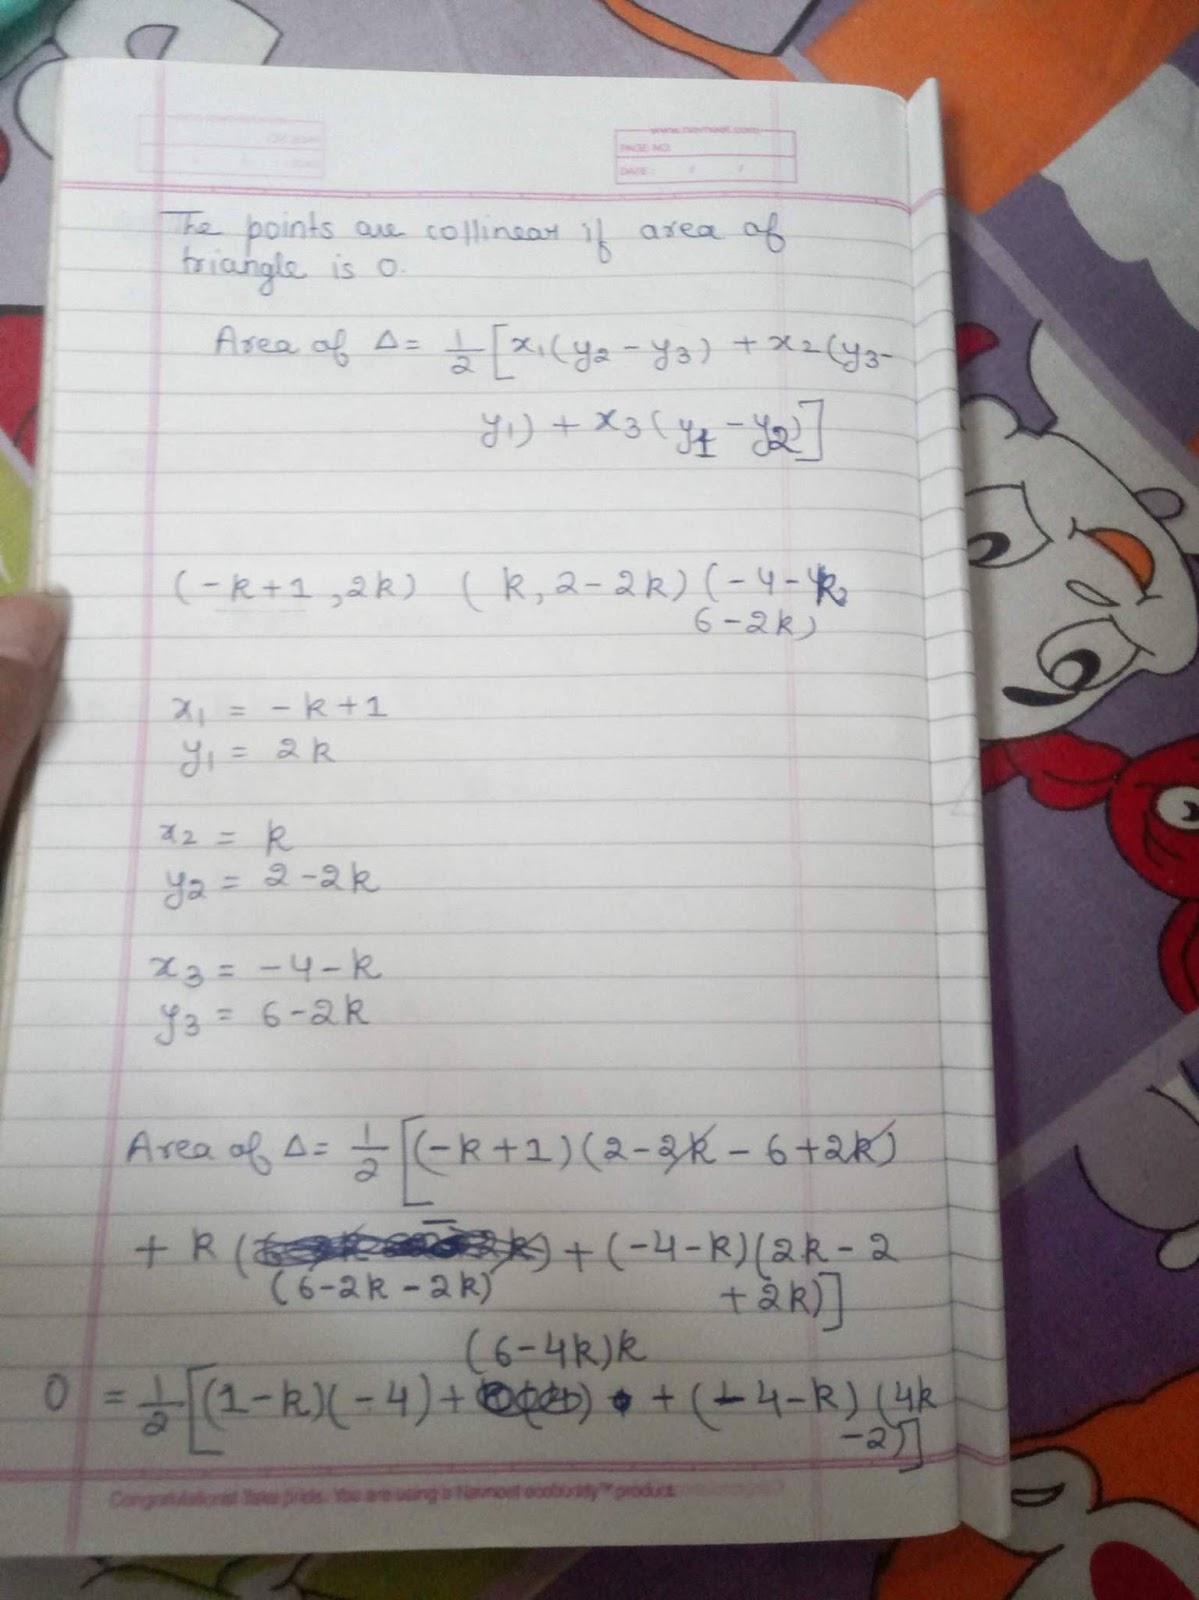 ignou dynamic solver bca st sem bcs solved assignment q 1